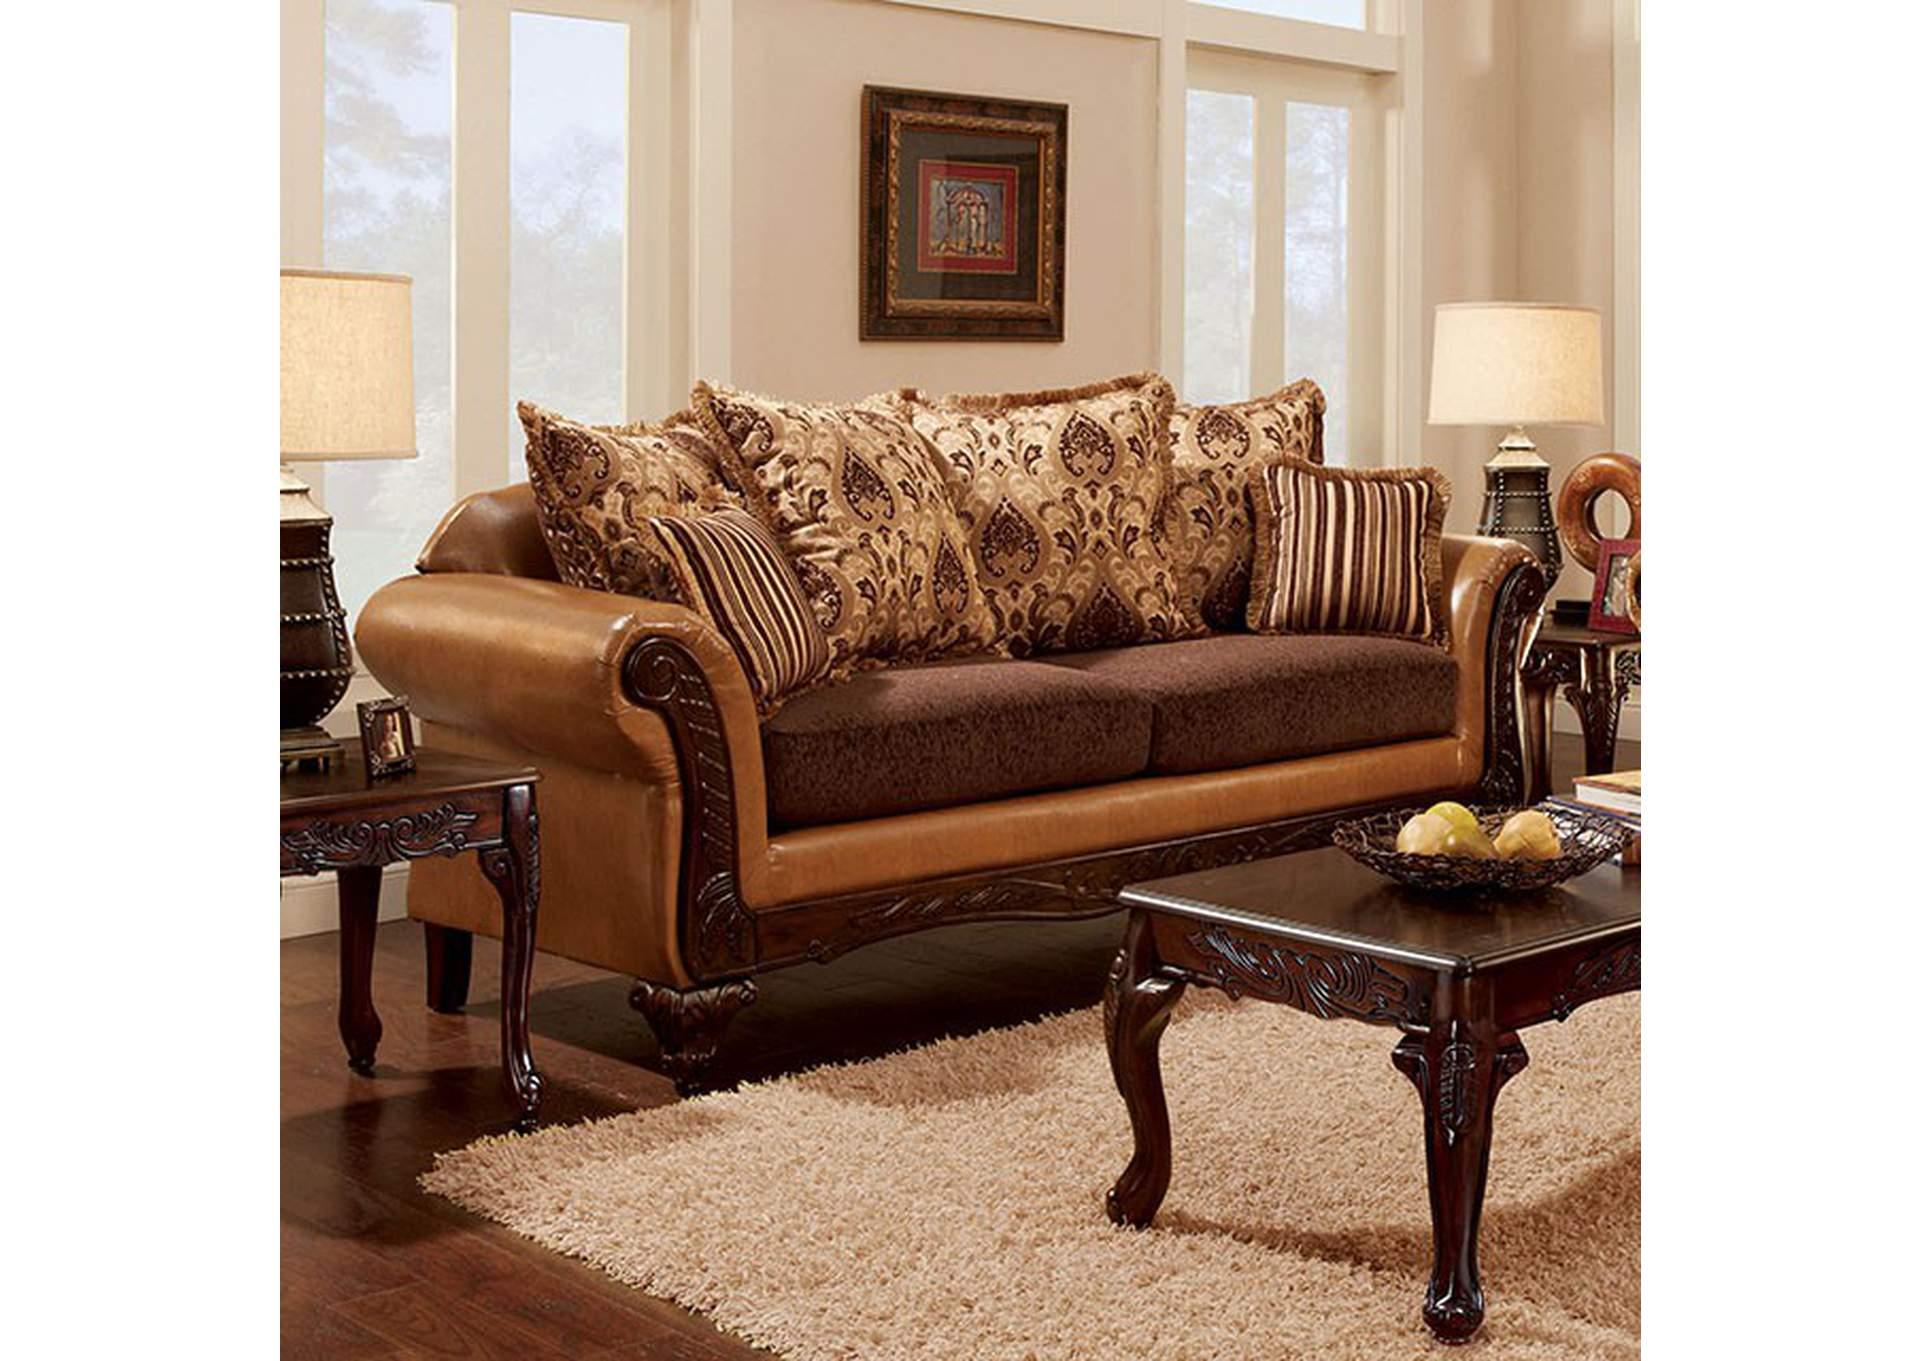 363334 Isabella Camel Brown Sofa